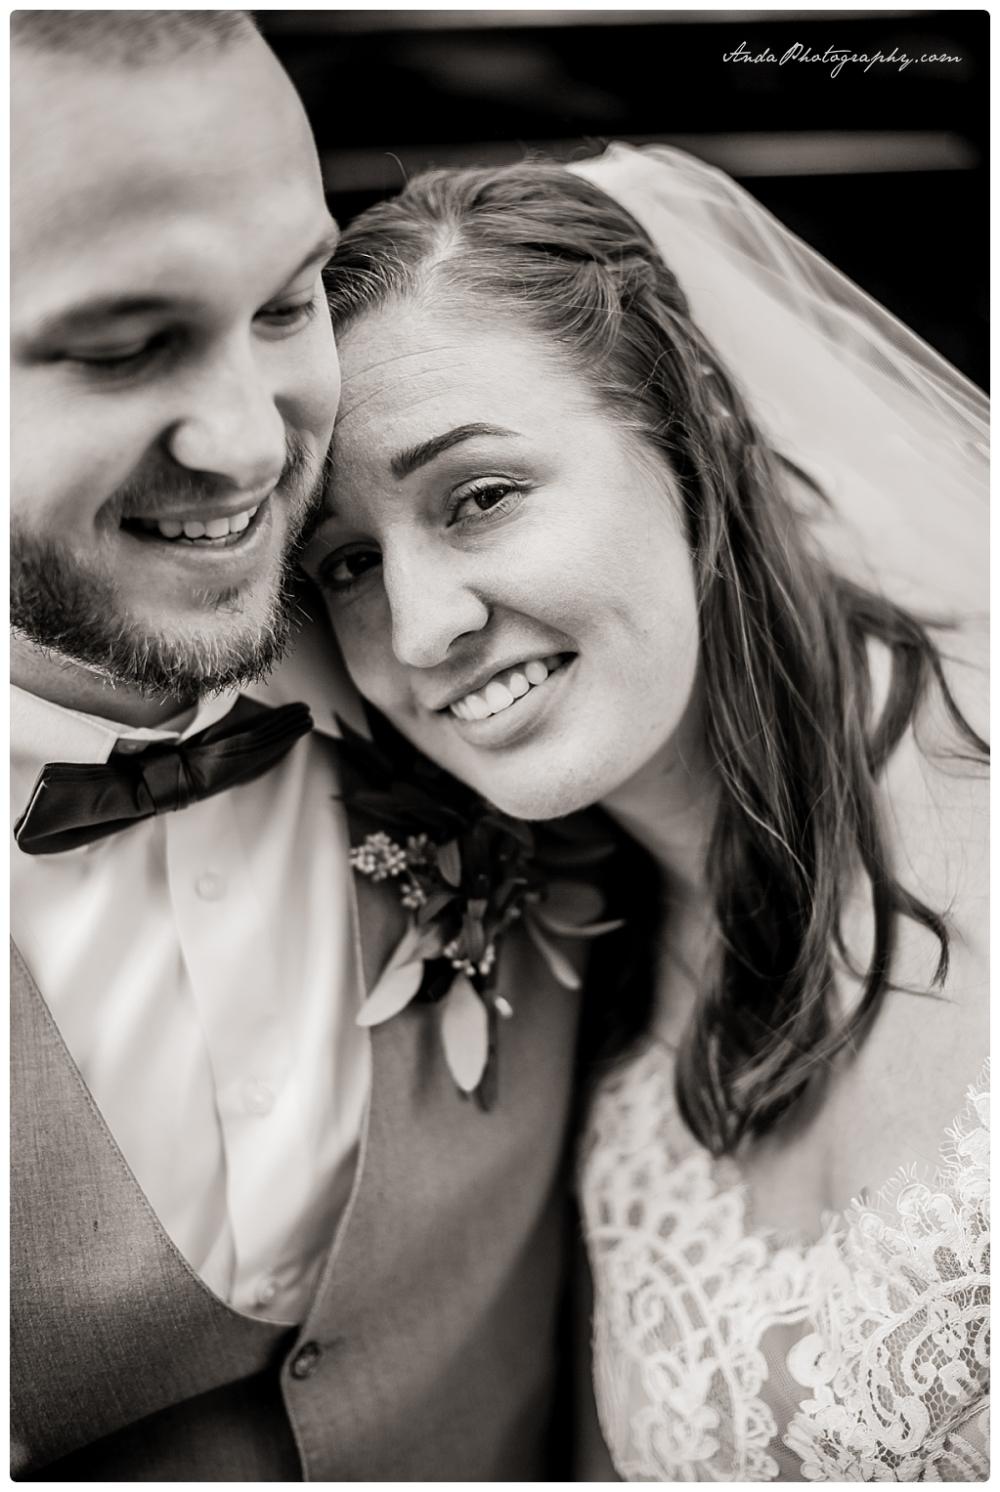 Anda Photography Bellingham wedding photography Bellingham lifestyle wedding photographer Maplehurst Farms_0025